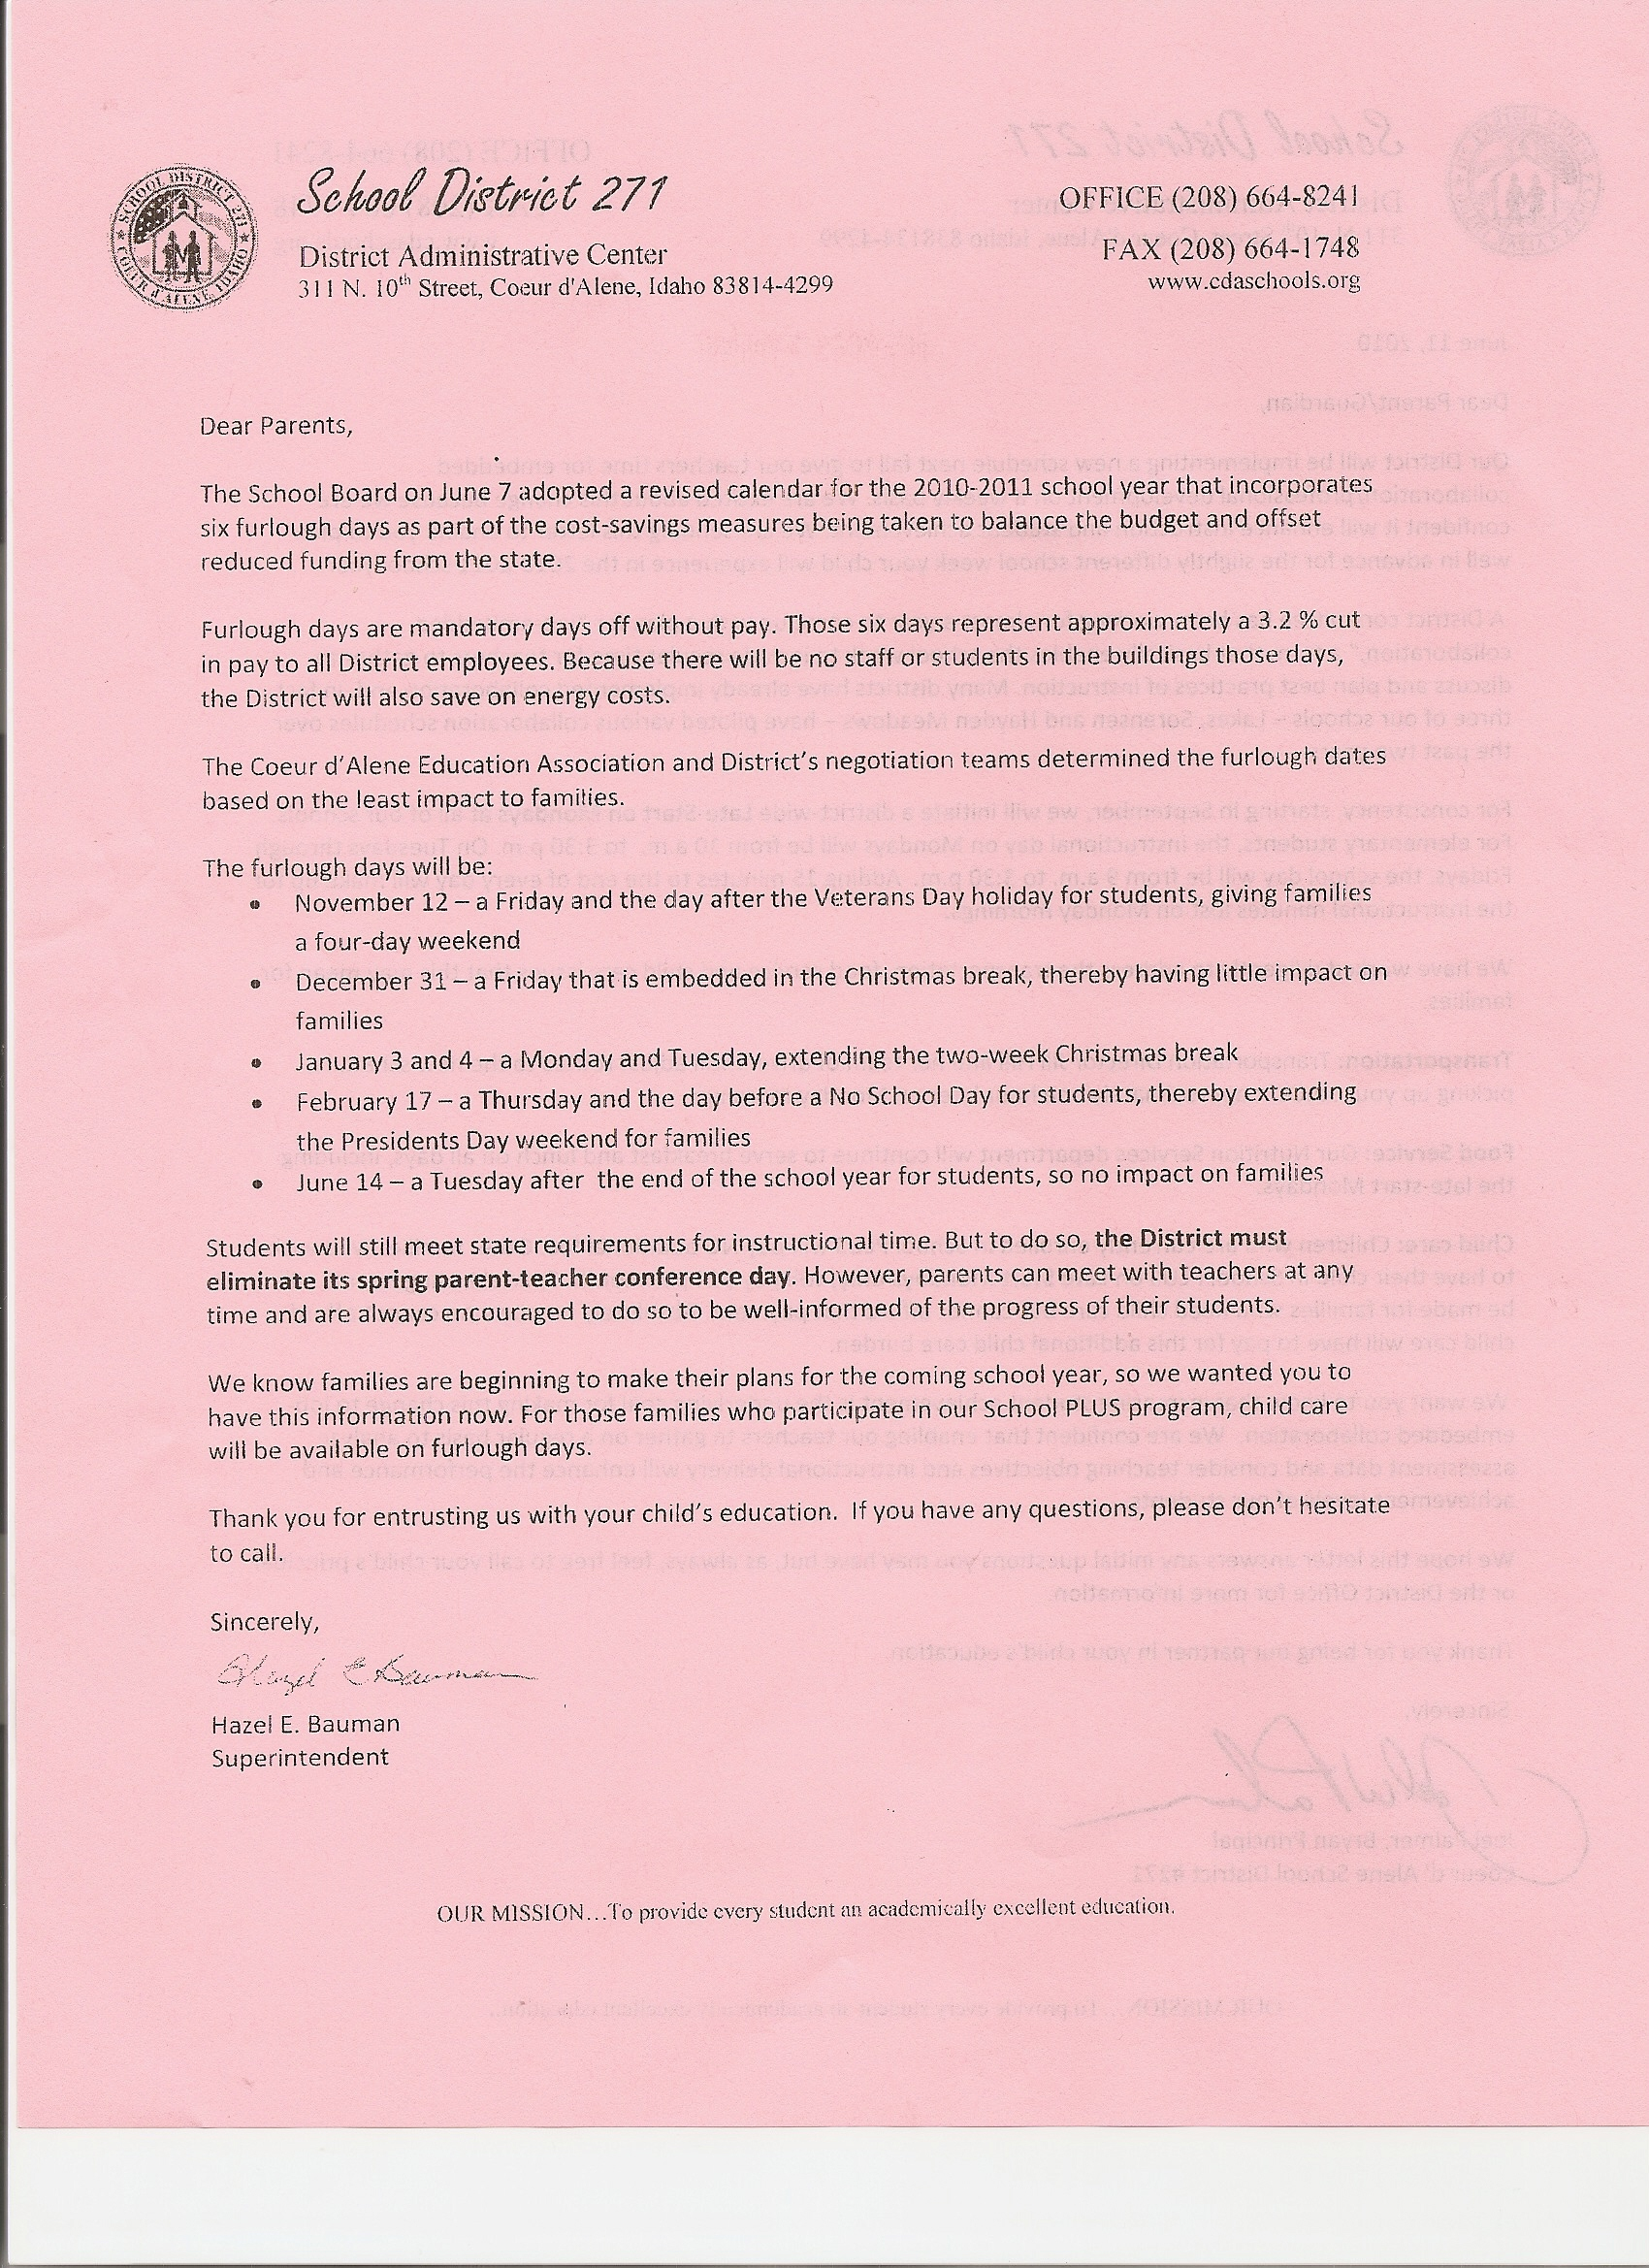 cda school district lists furlough days